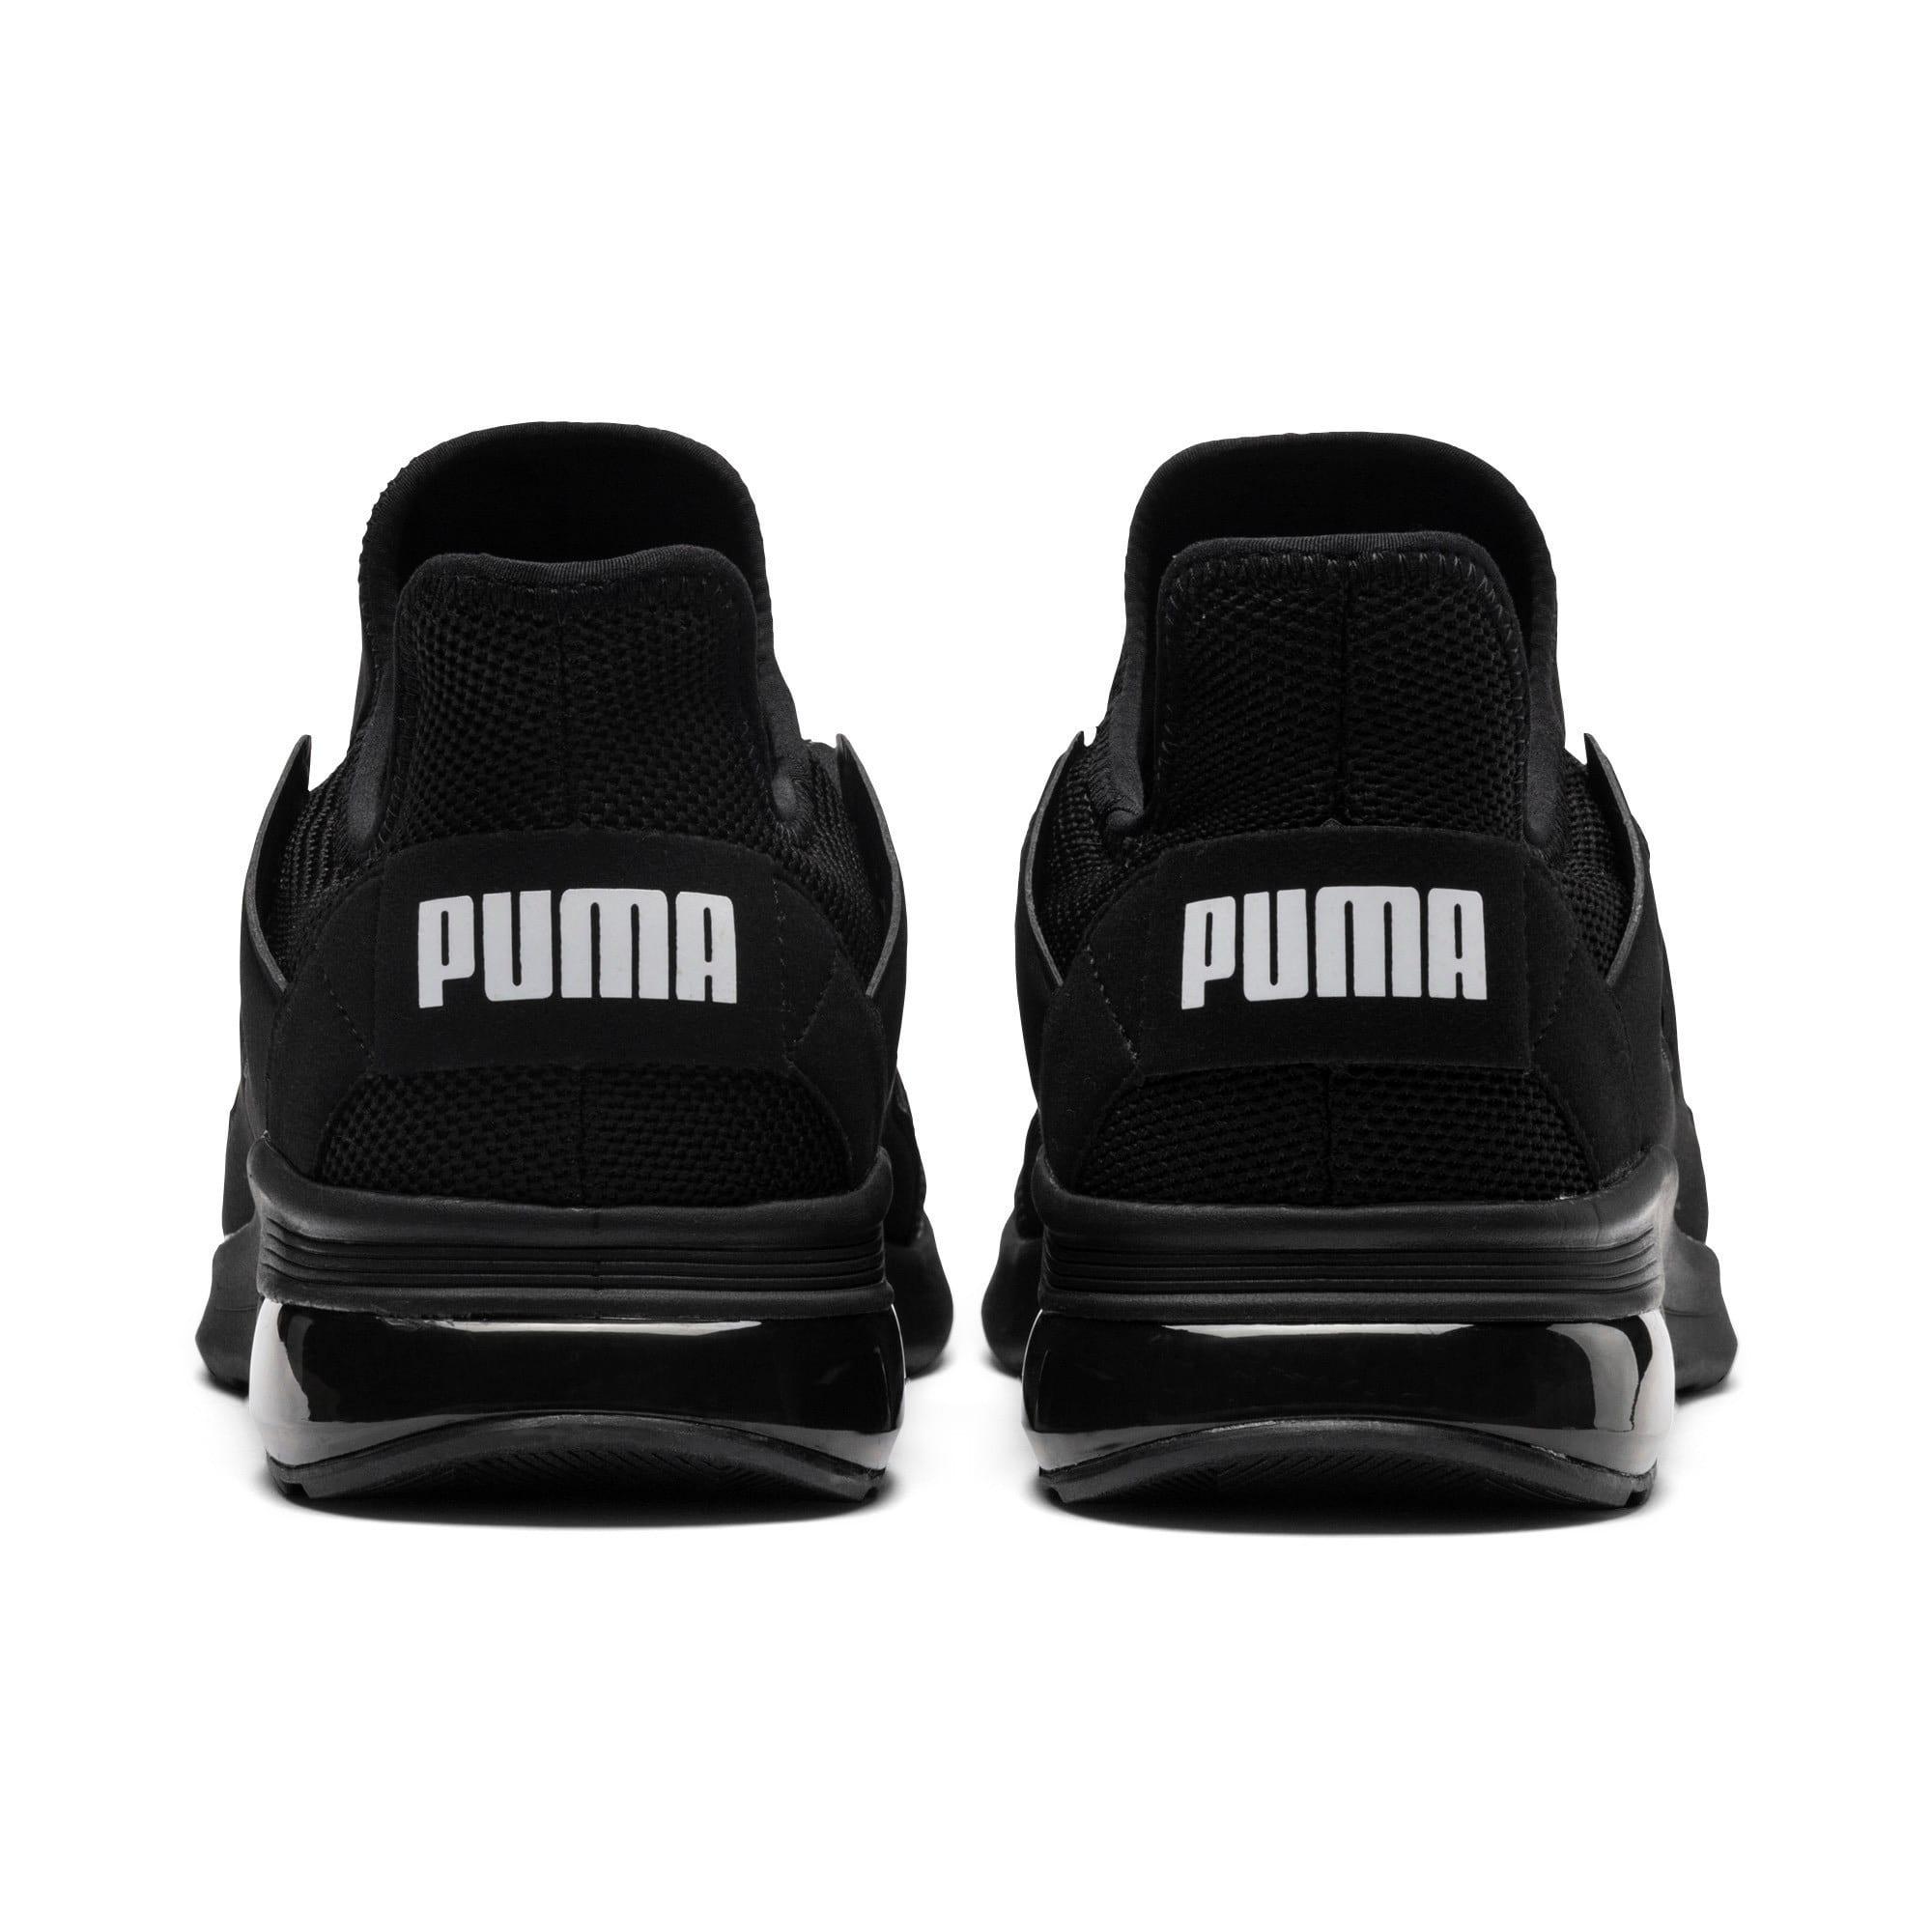 Thumbnail 4 of Electron Street Trainers, Puma Black-Puma Black-Black, medium-IND